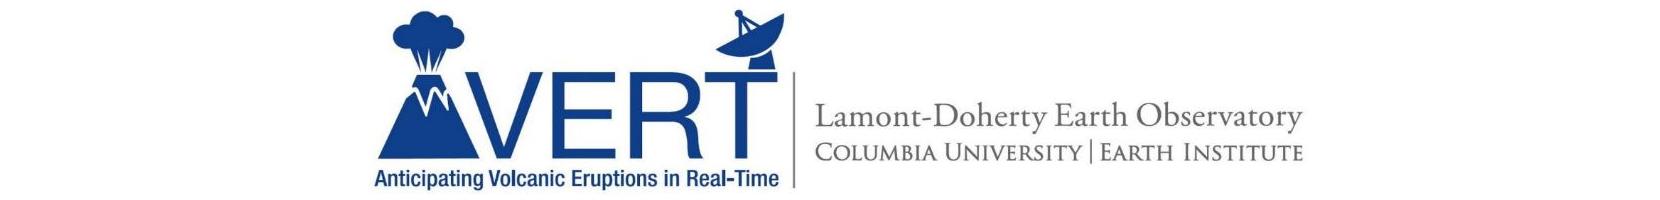 Lamont-Doherty Earth Observatory of Columbia University logo